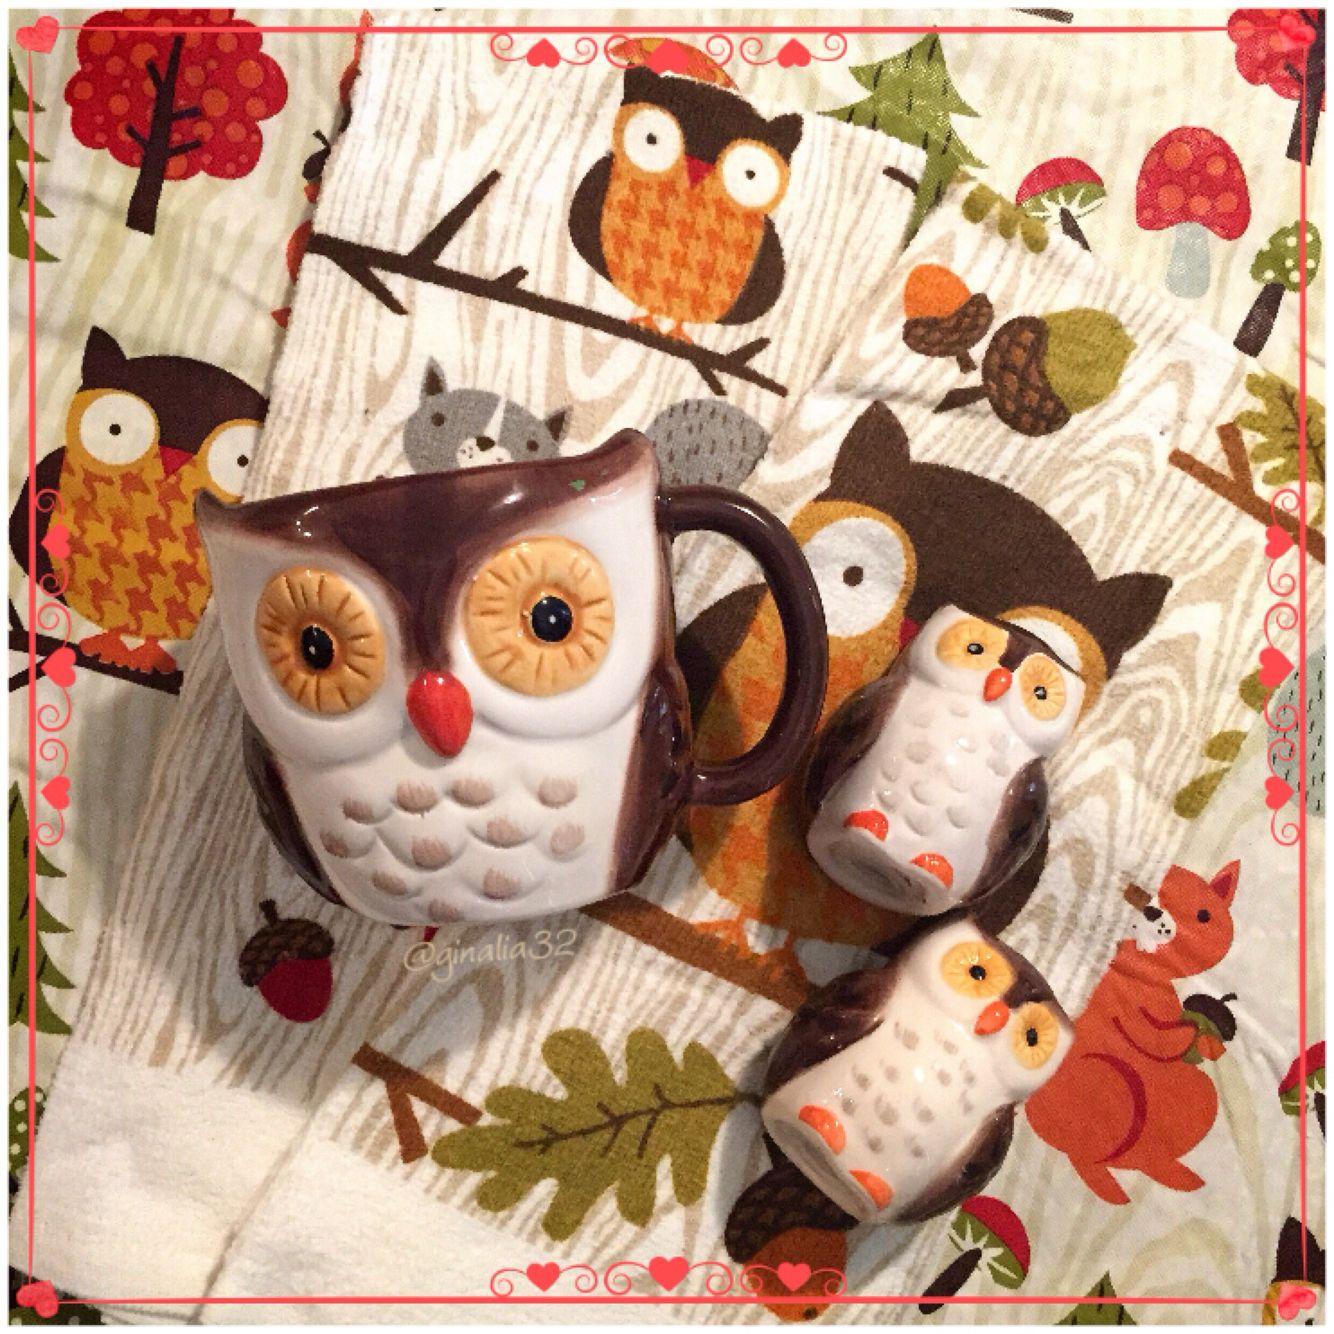 Cute Fall Owl Decor I Picked Up At Wal Mart...tablecloth,